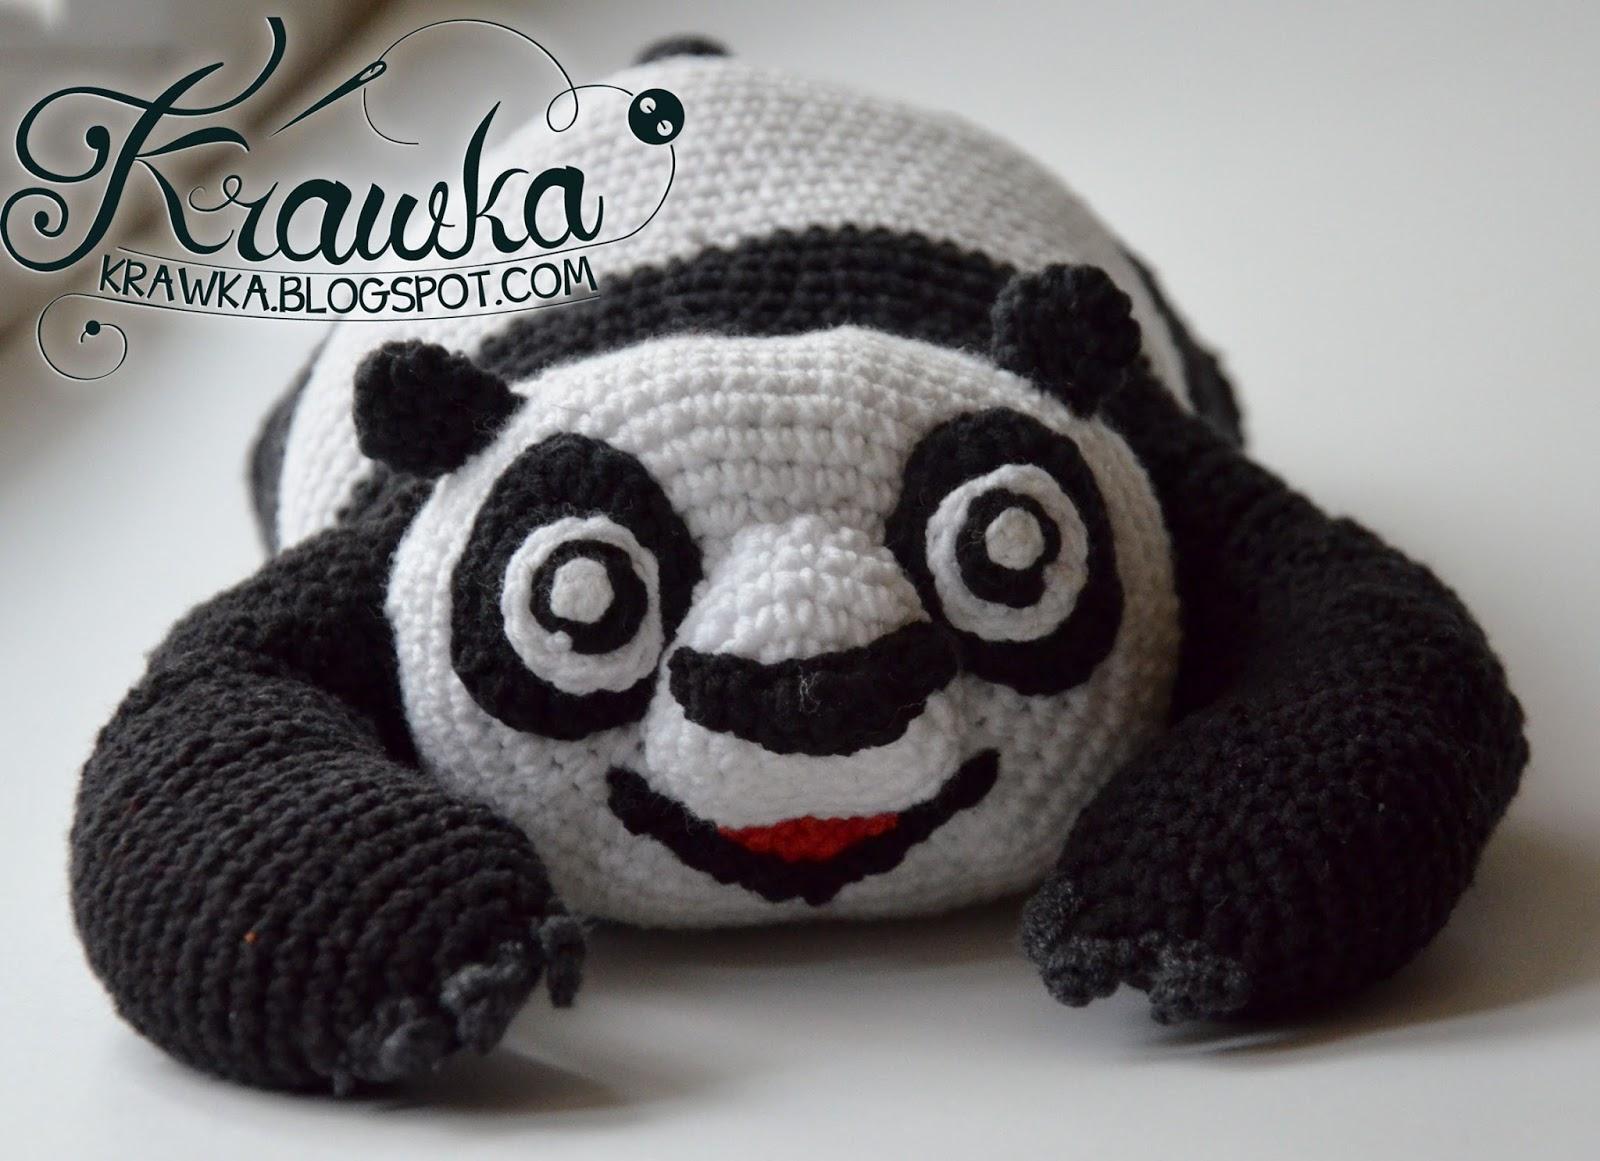 Amigurumi Oso Panda Patron : Krawka kung fu panda crochet pattern